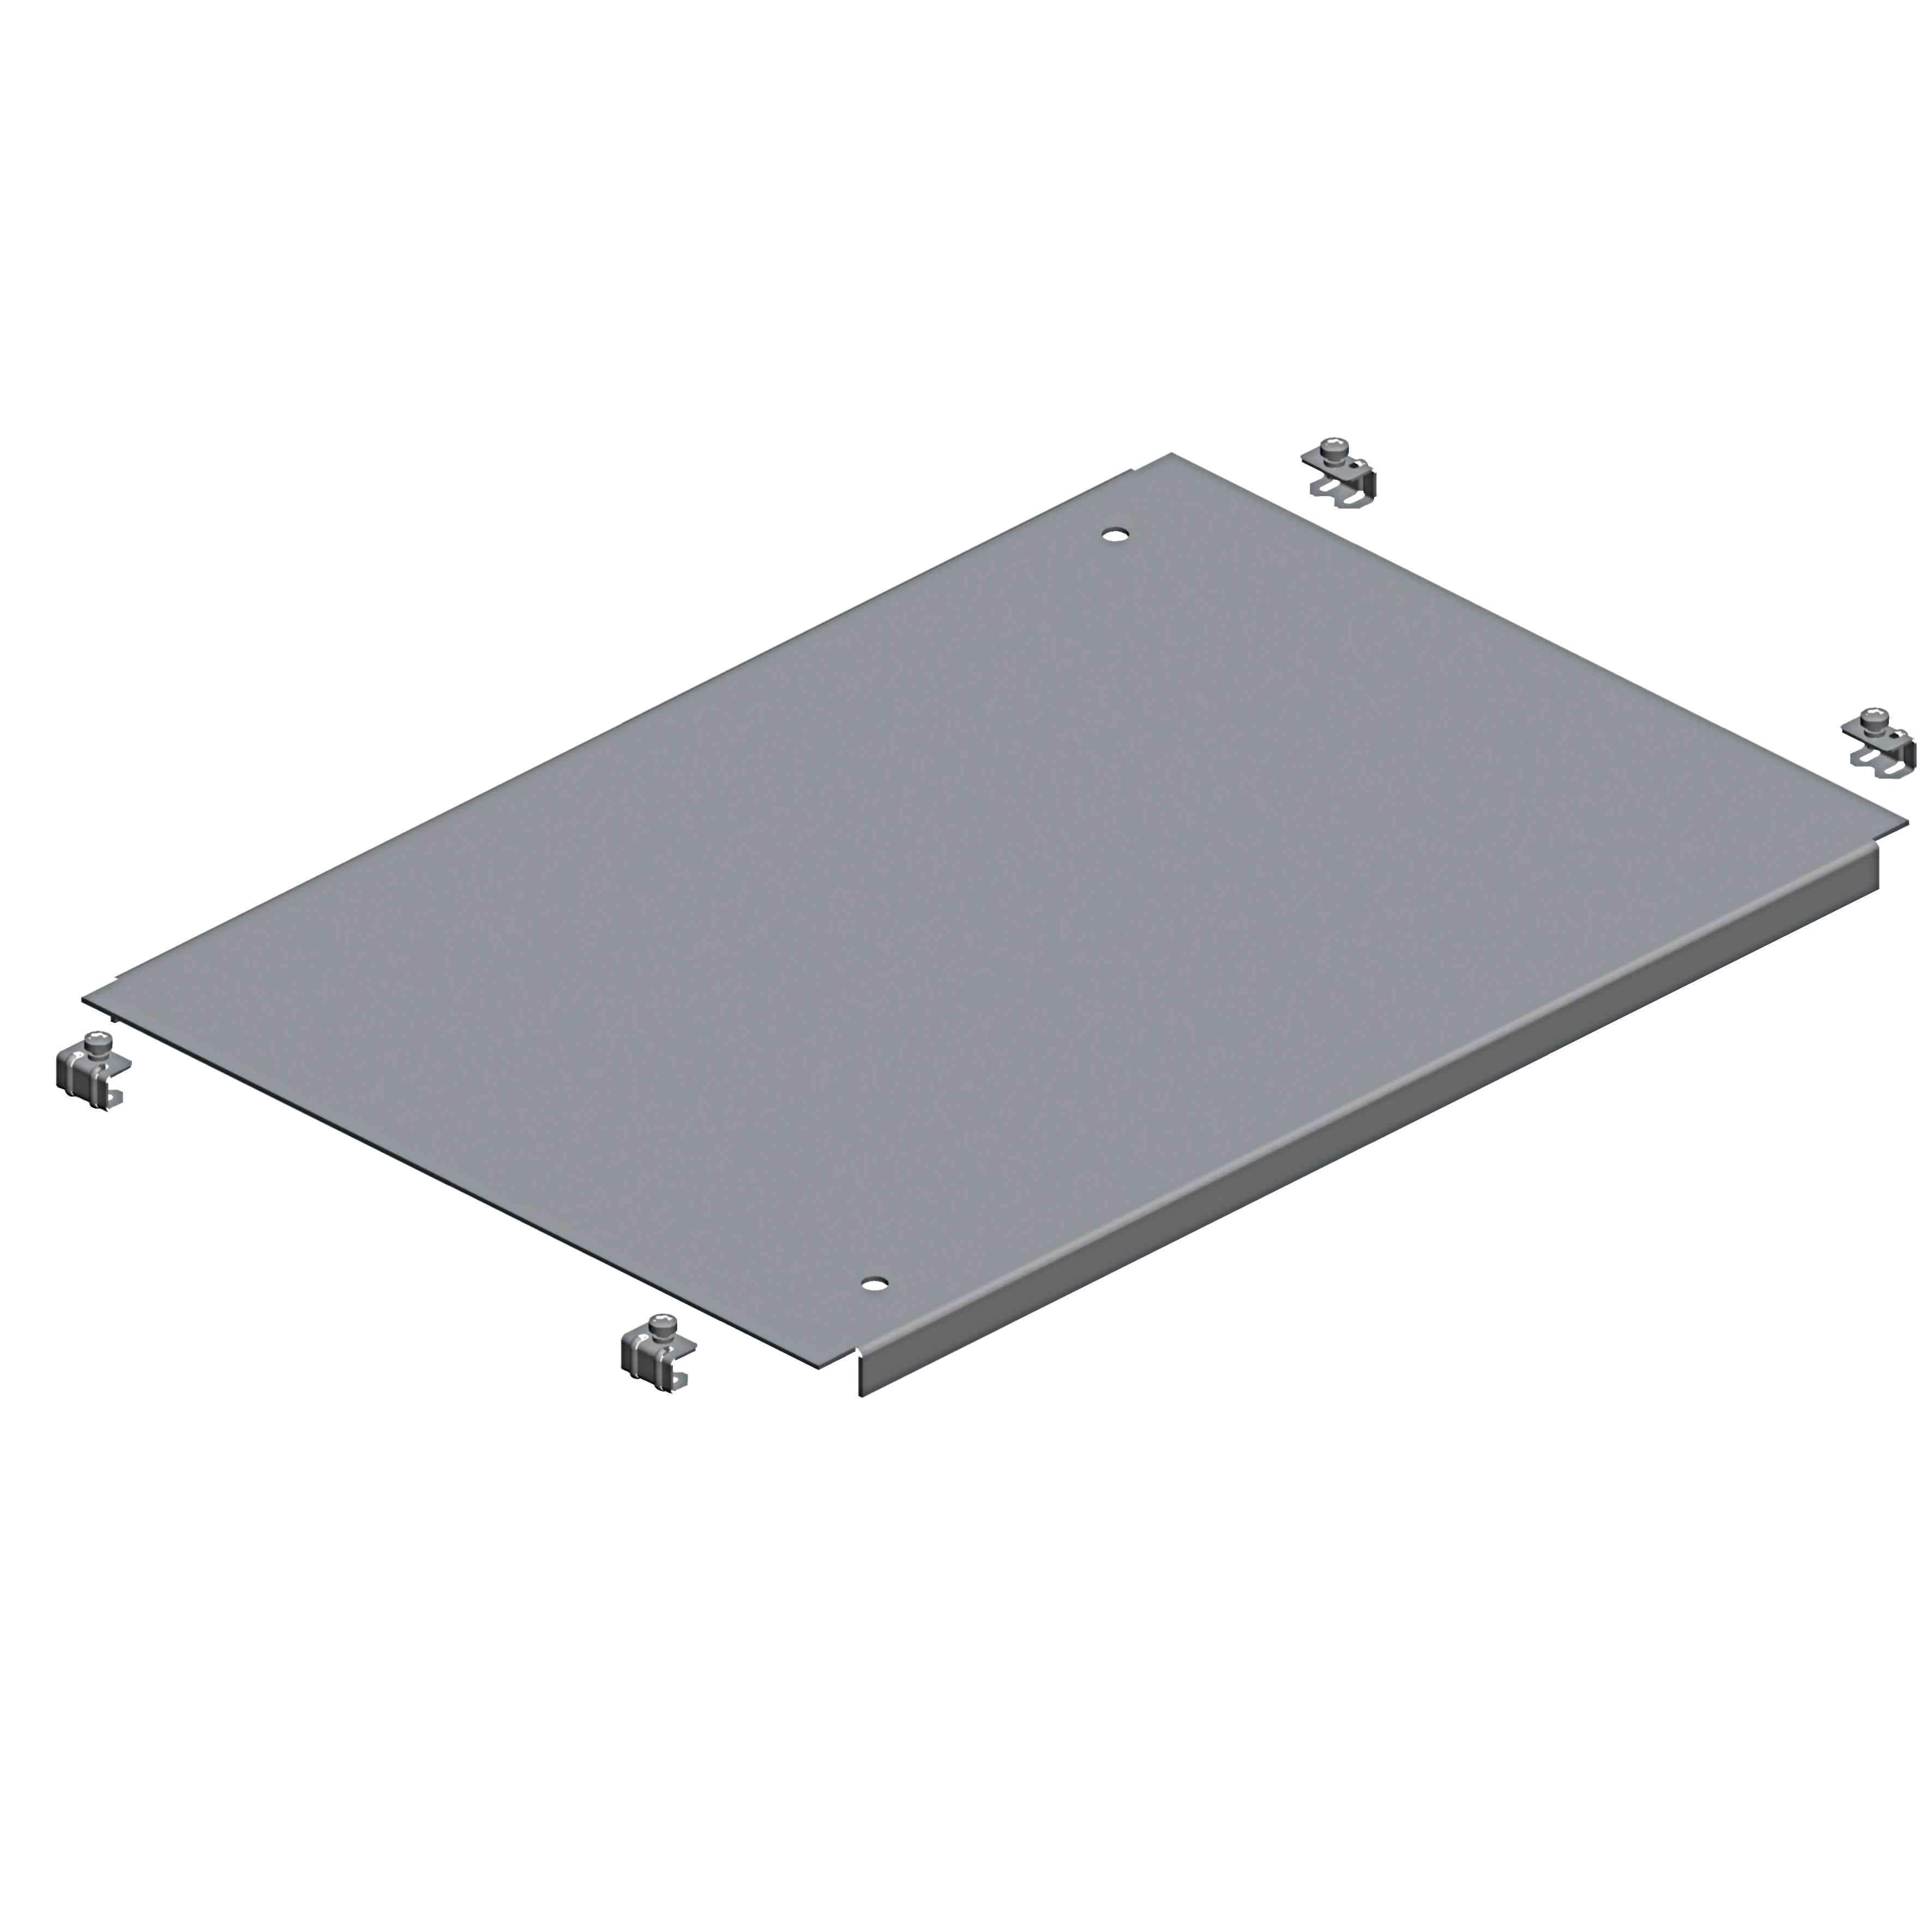 Spacial SM navadna plošča s kab. uvodnicami - pritr. s sponkami - 800 x 400 mm